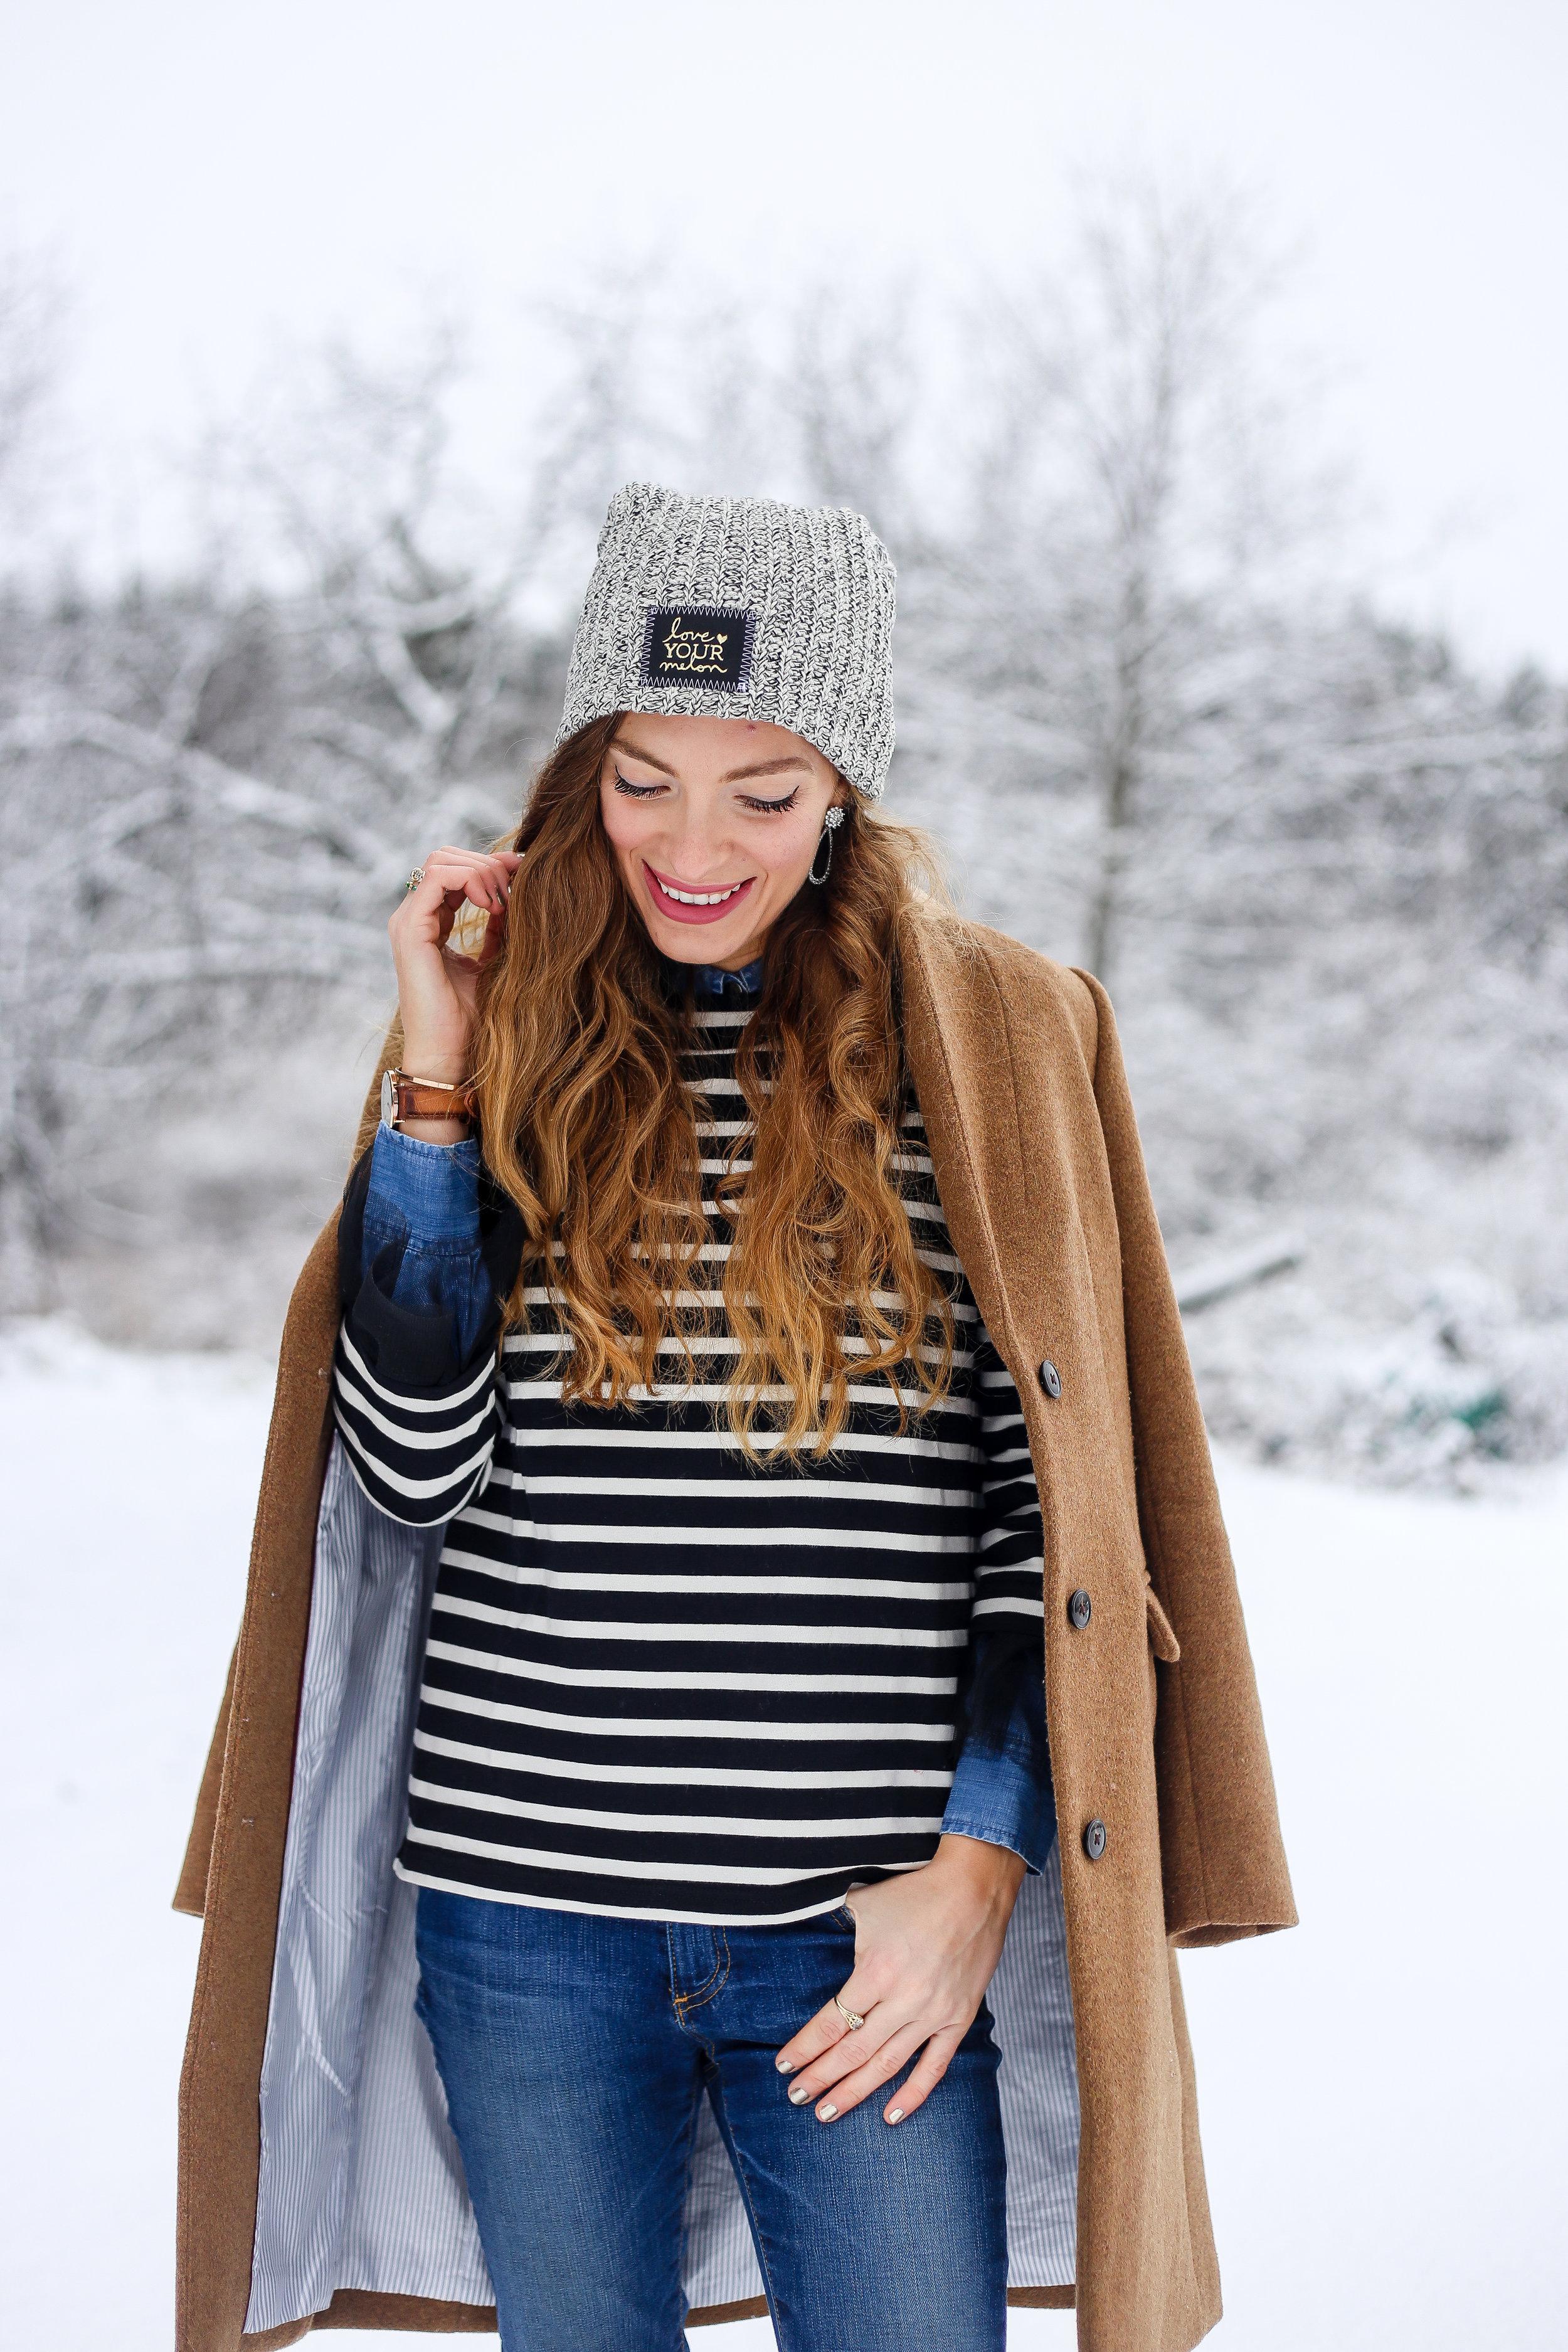 Snow Day- Enchanting Elegance